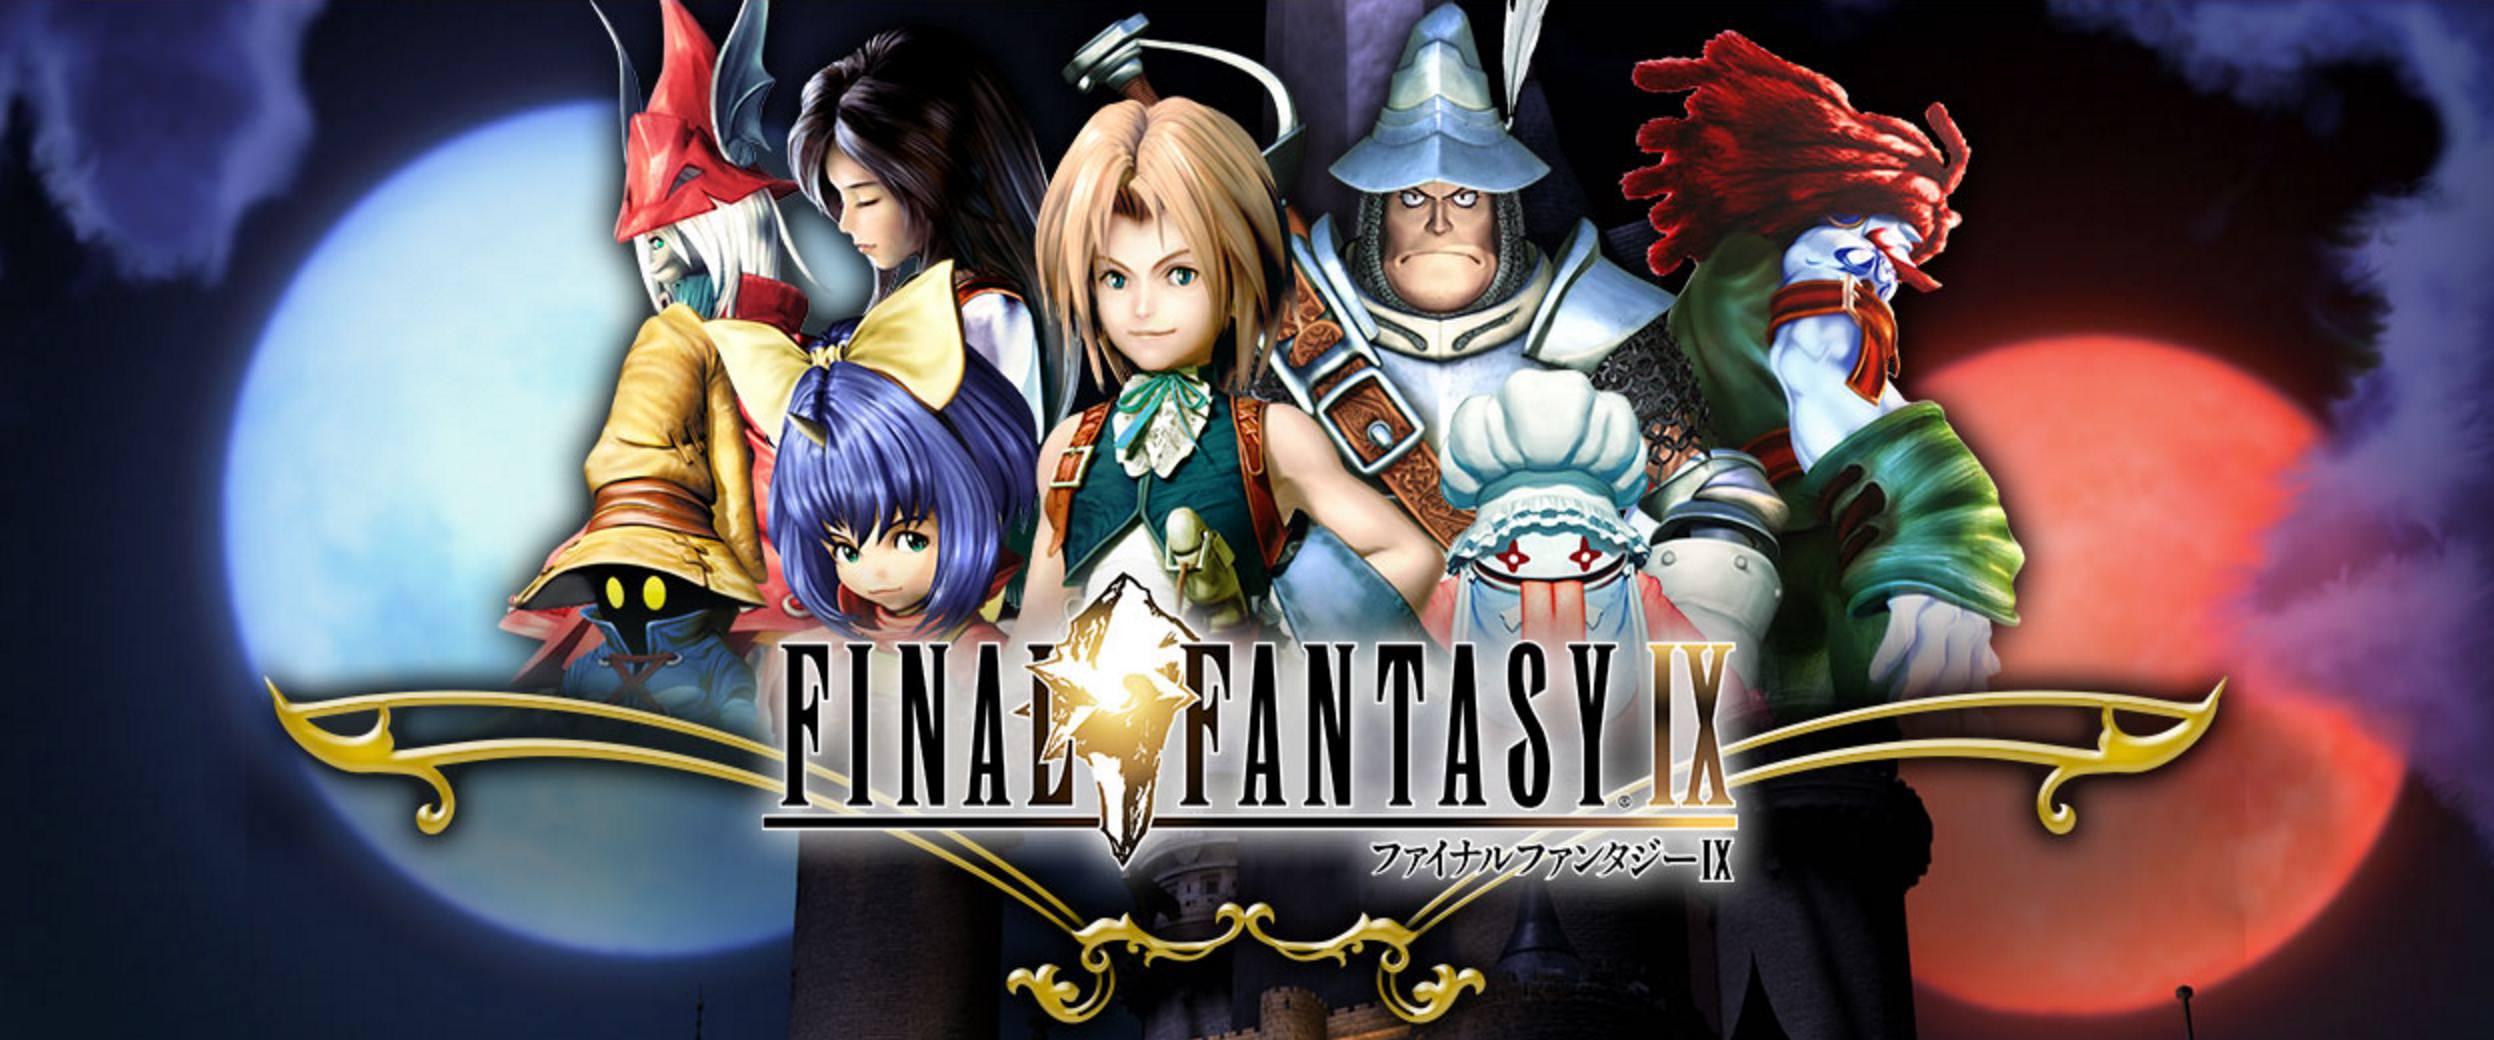 Final fantasy 9 release